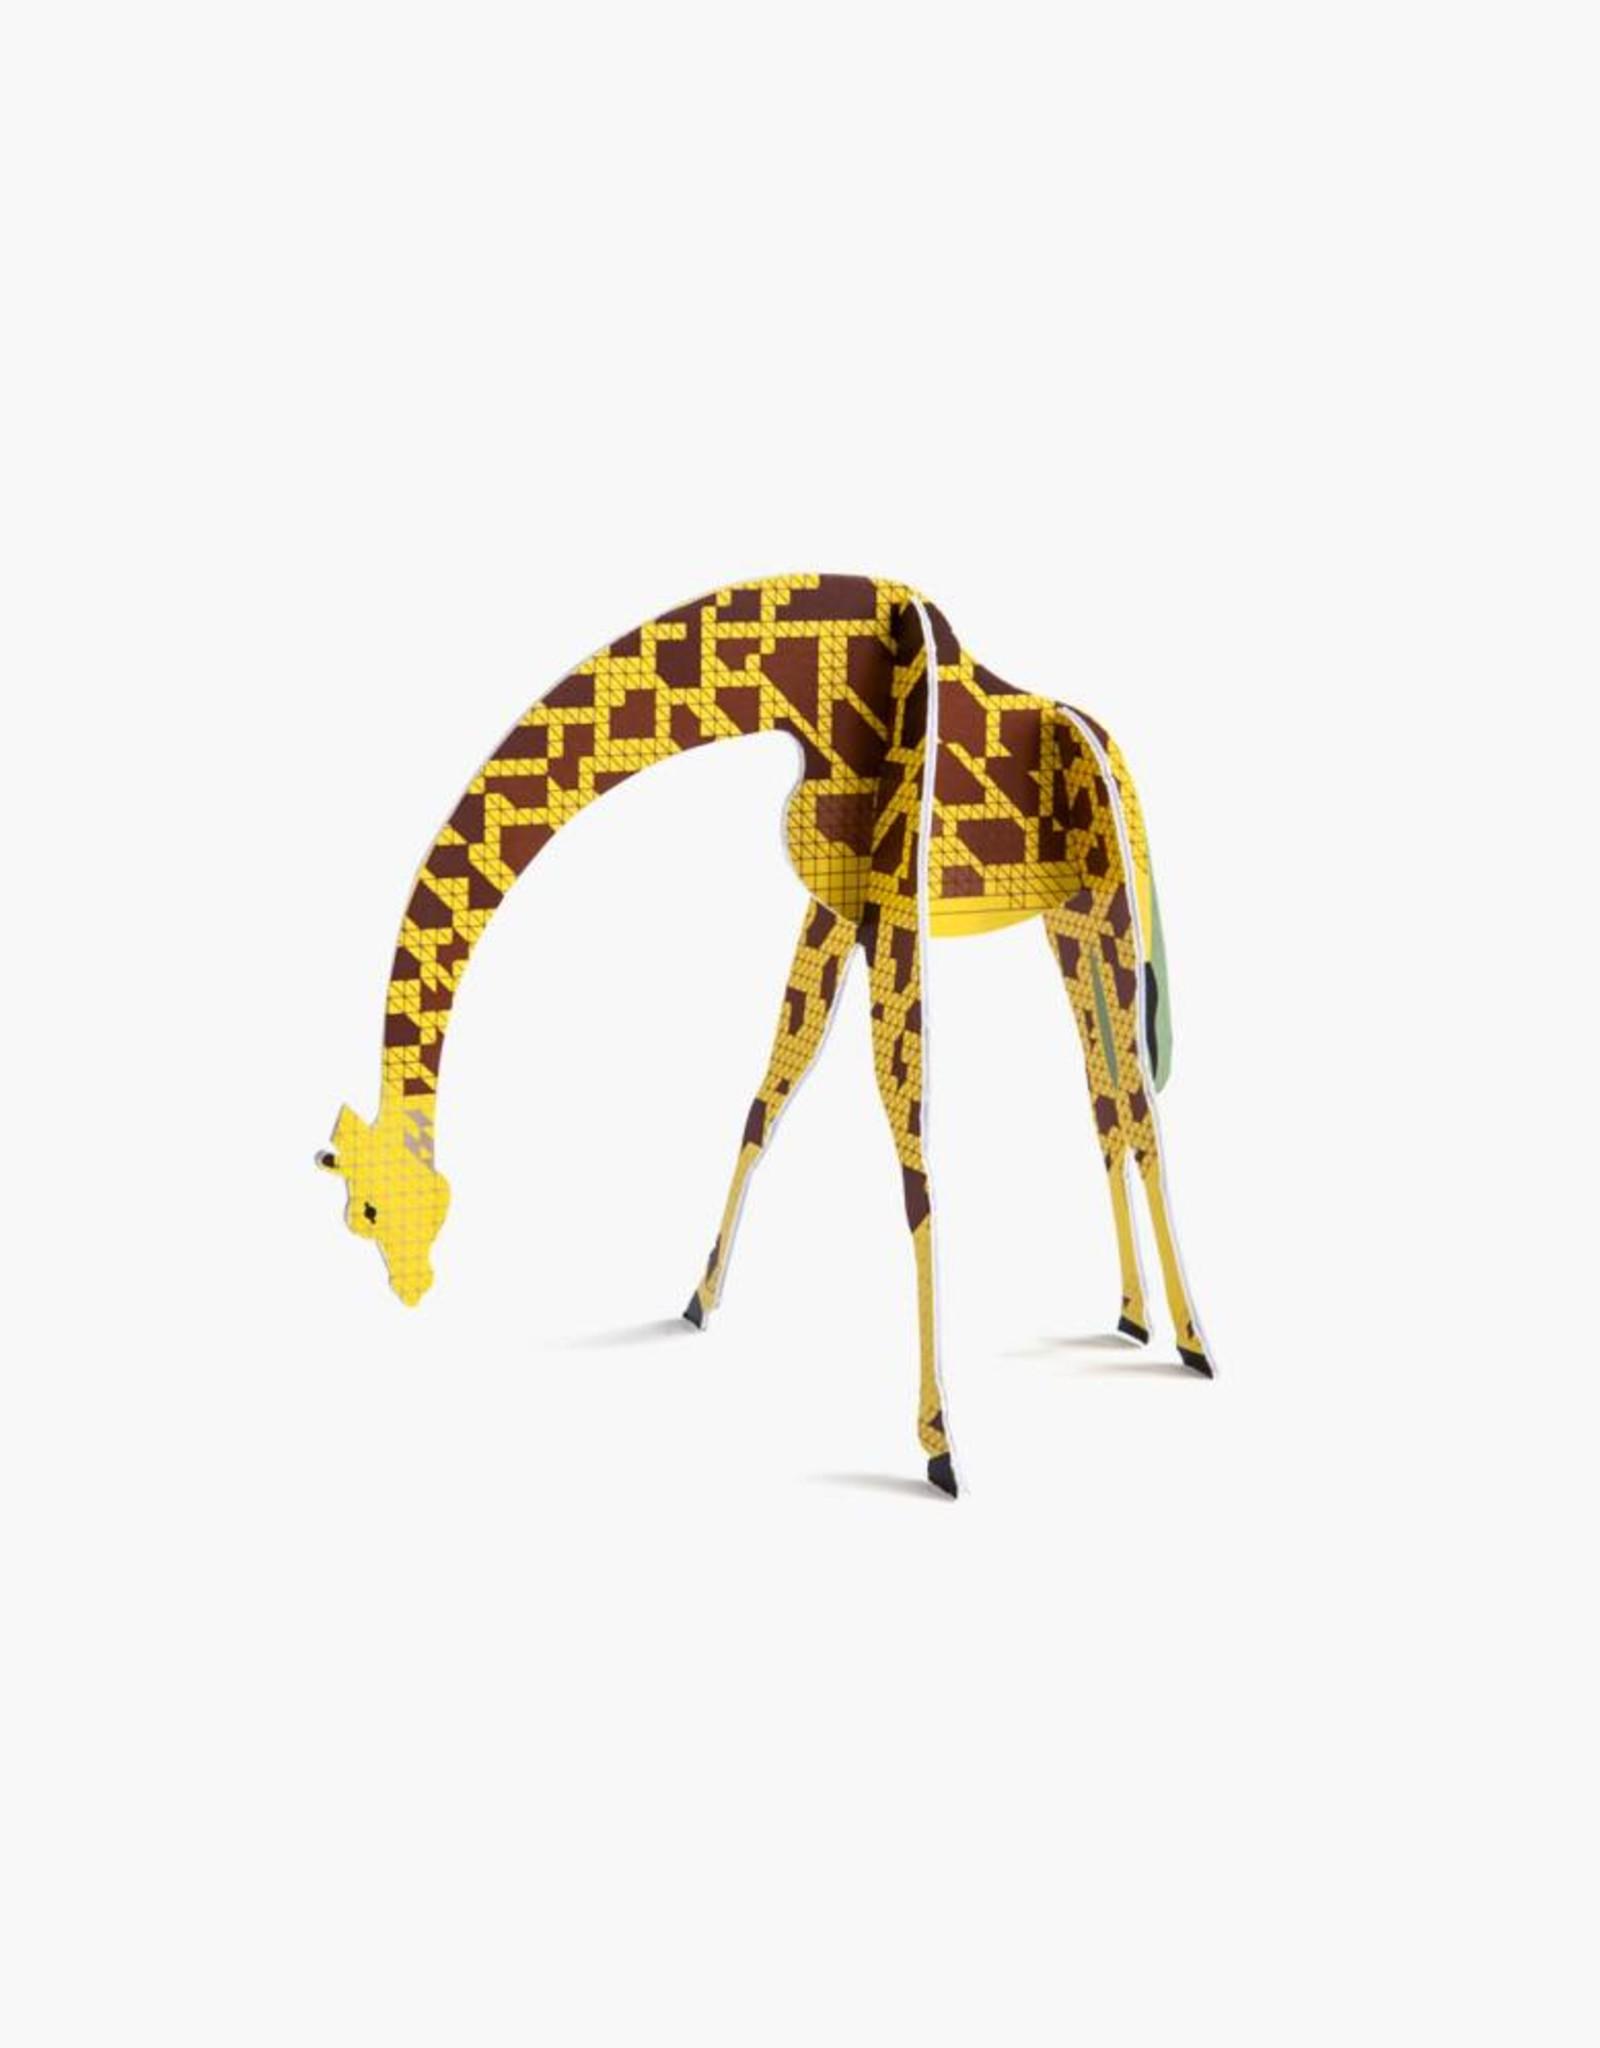 Studioroof Studio Roof Pop Out Card Giraffe